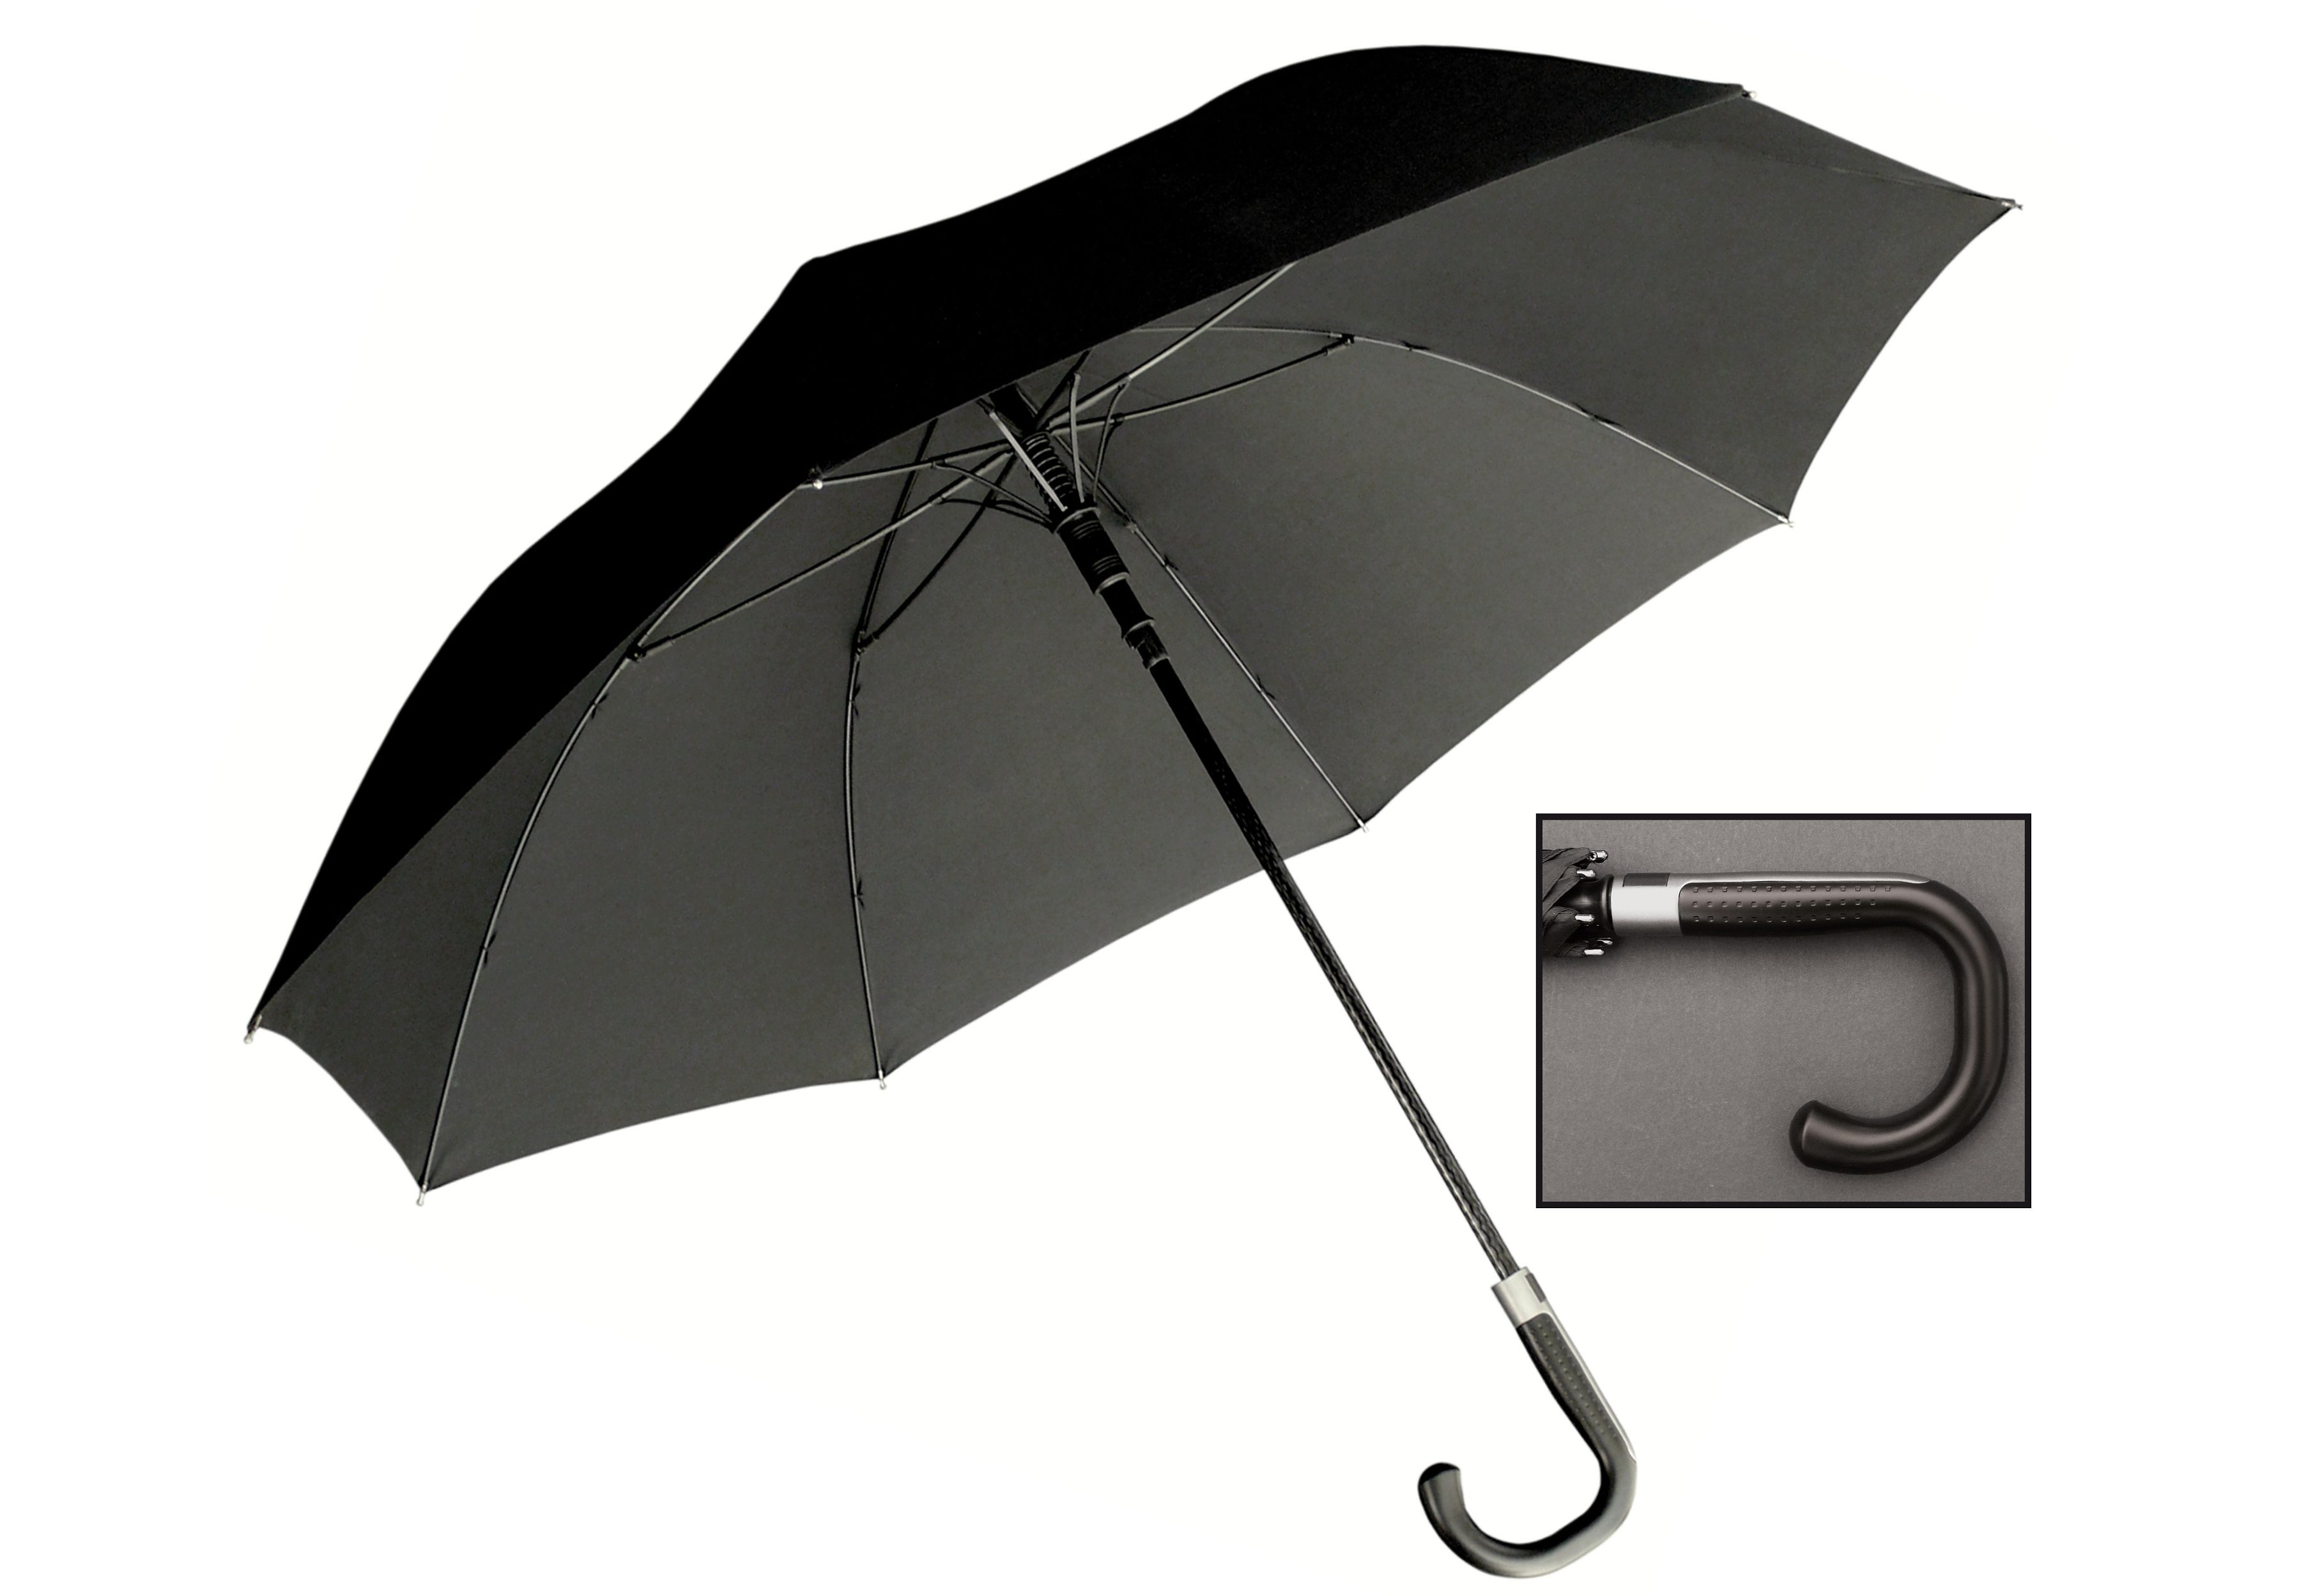 Euroschirm, Stockregenschirm ´´Partnerschirm´´ | Accessoires > Regenschirme > Sonstige Regenschirme | Schwarz | Glasfaser | EUROSCHIRM®